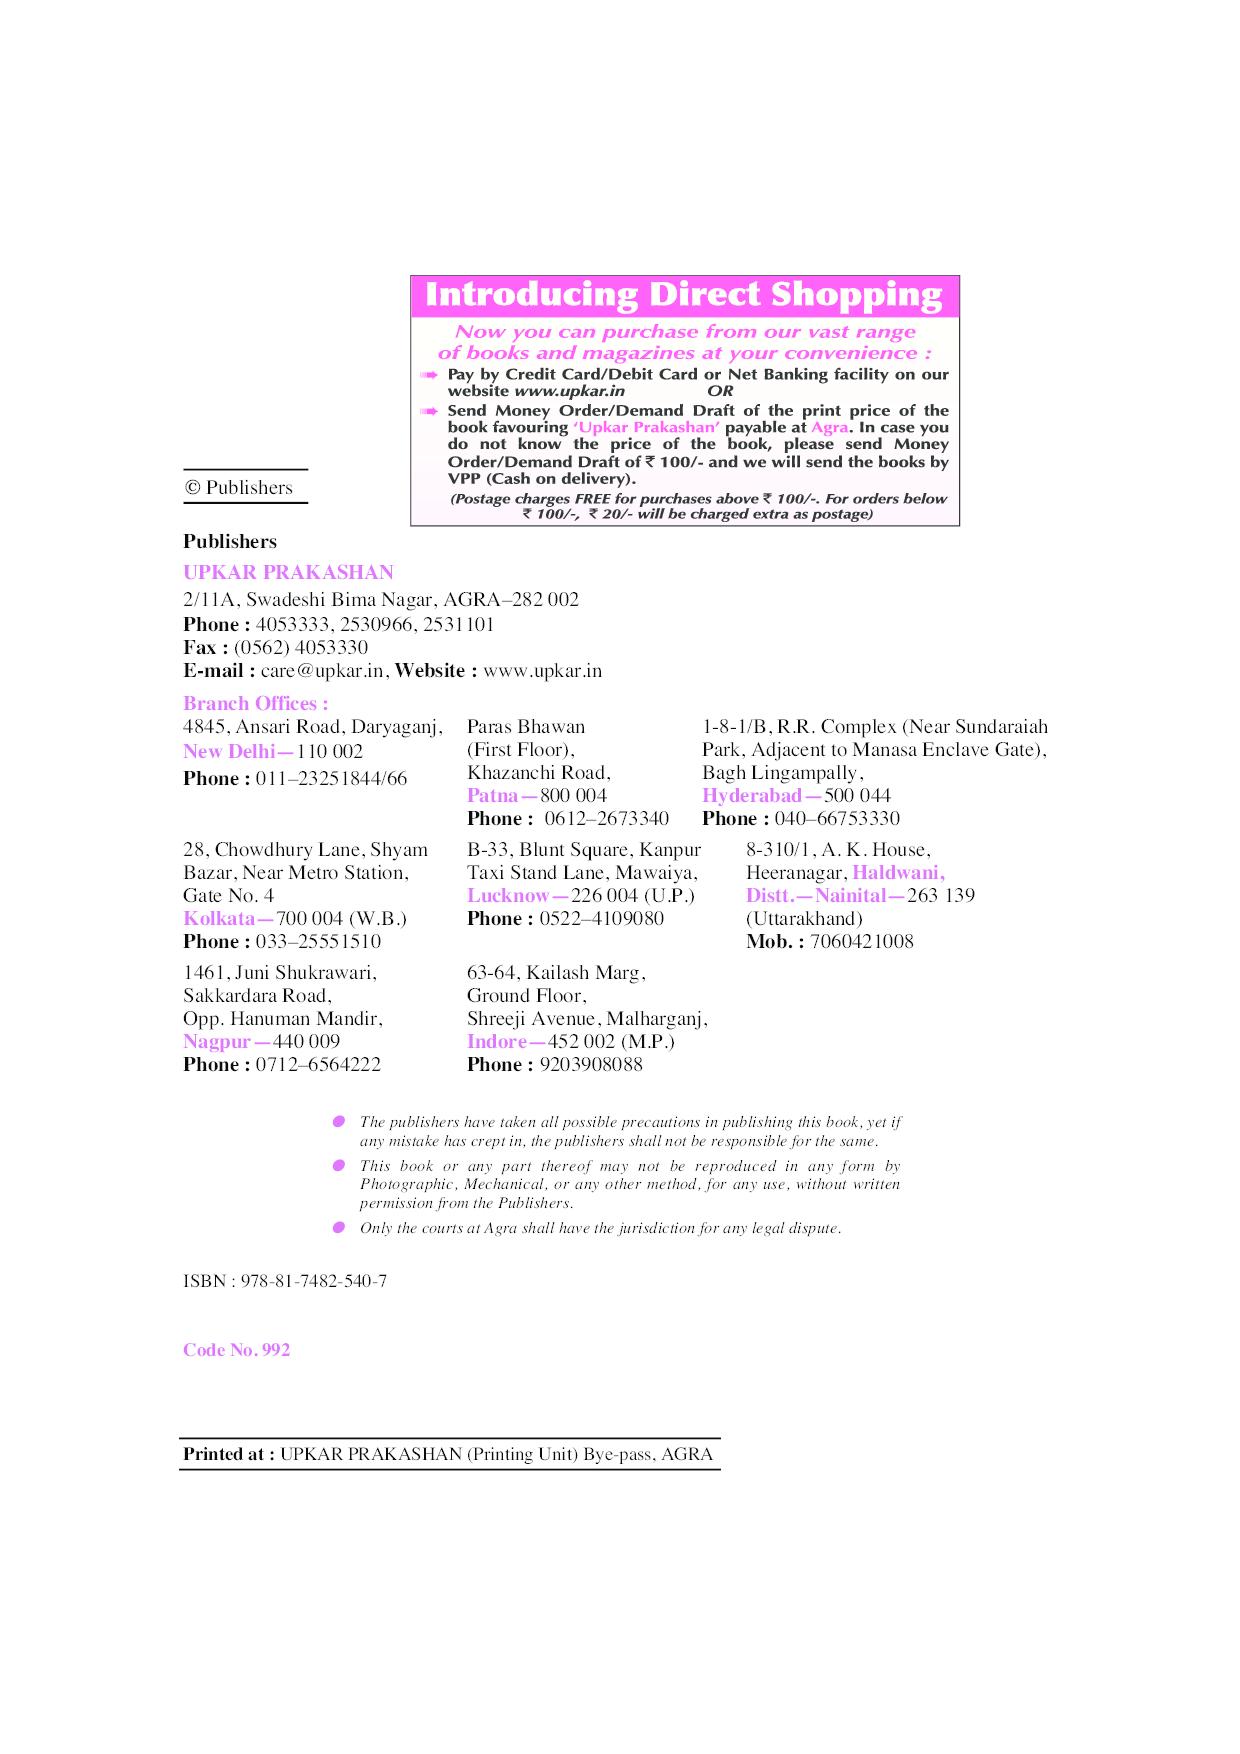 Uttar Pradesh B.Ed. Joint Entrance Test (Arts Group) - Page 3